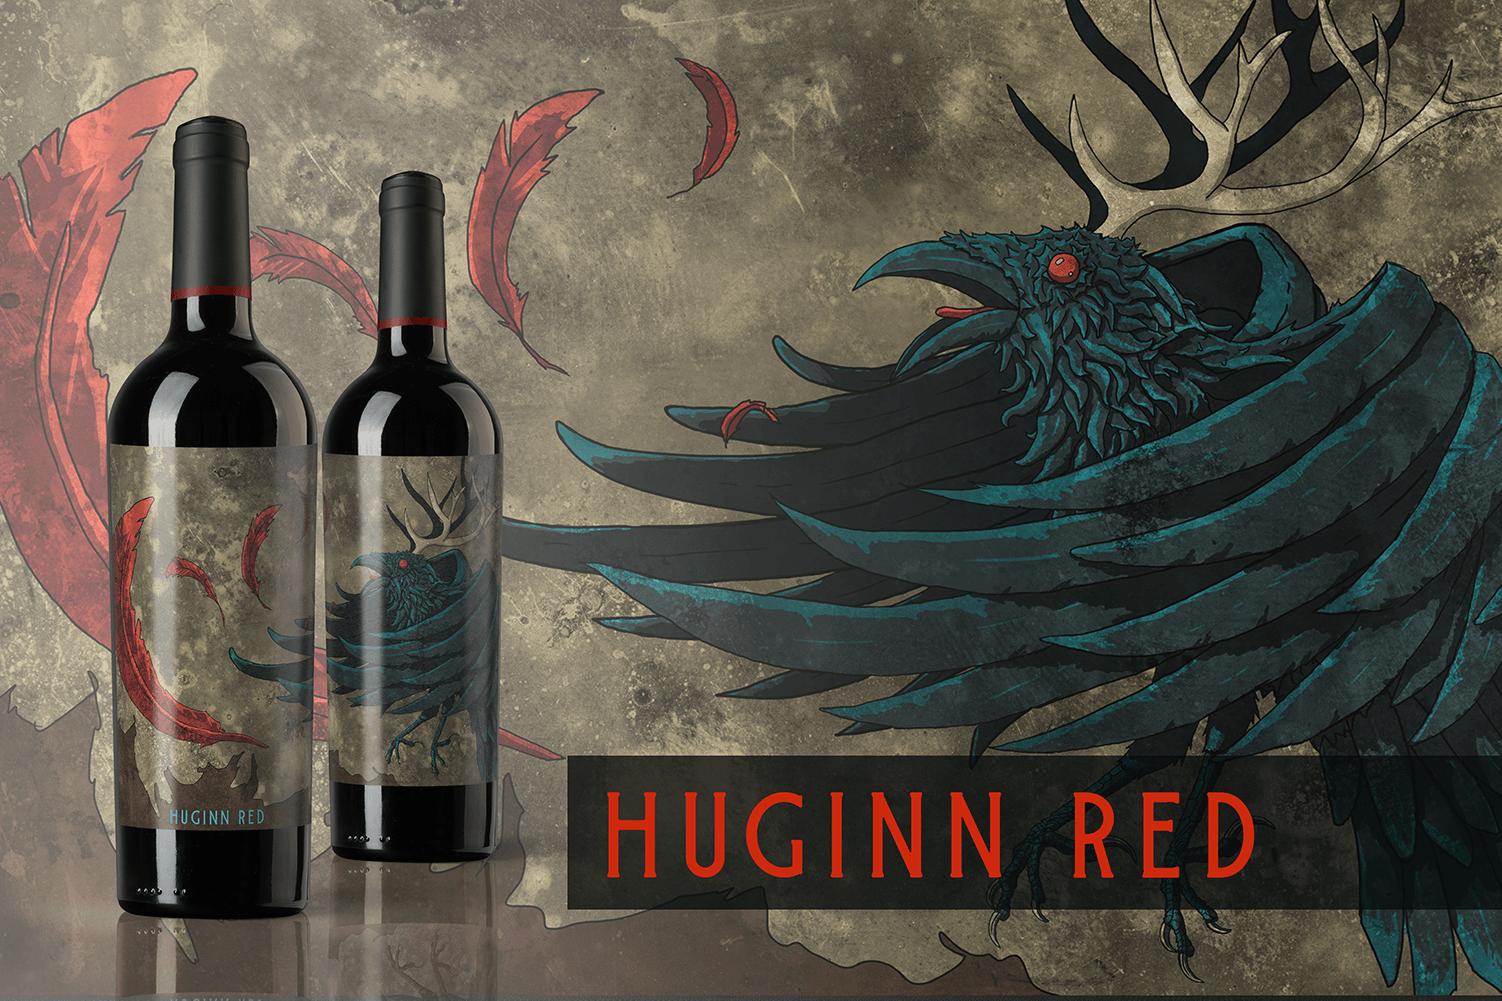 Huginn Red Wine-front-packaging-scene_mockup 3.png